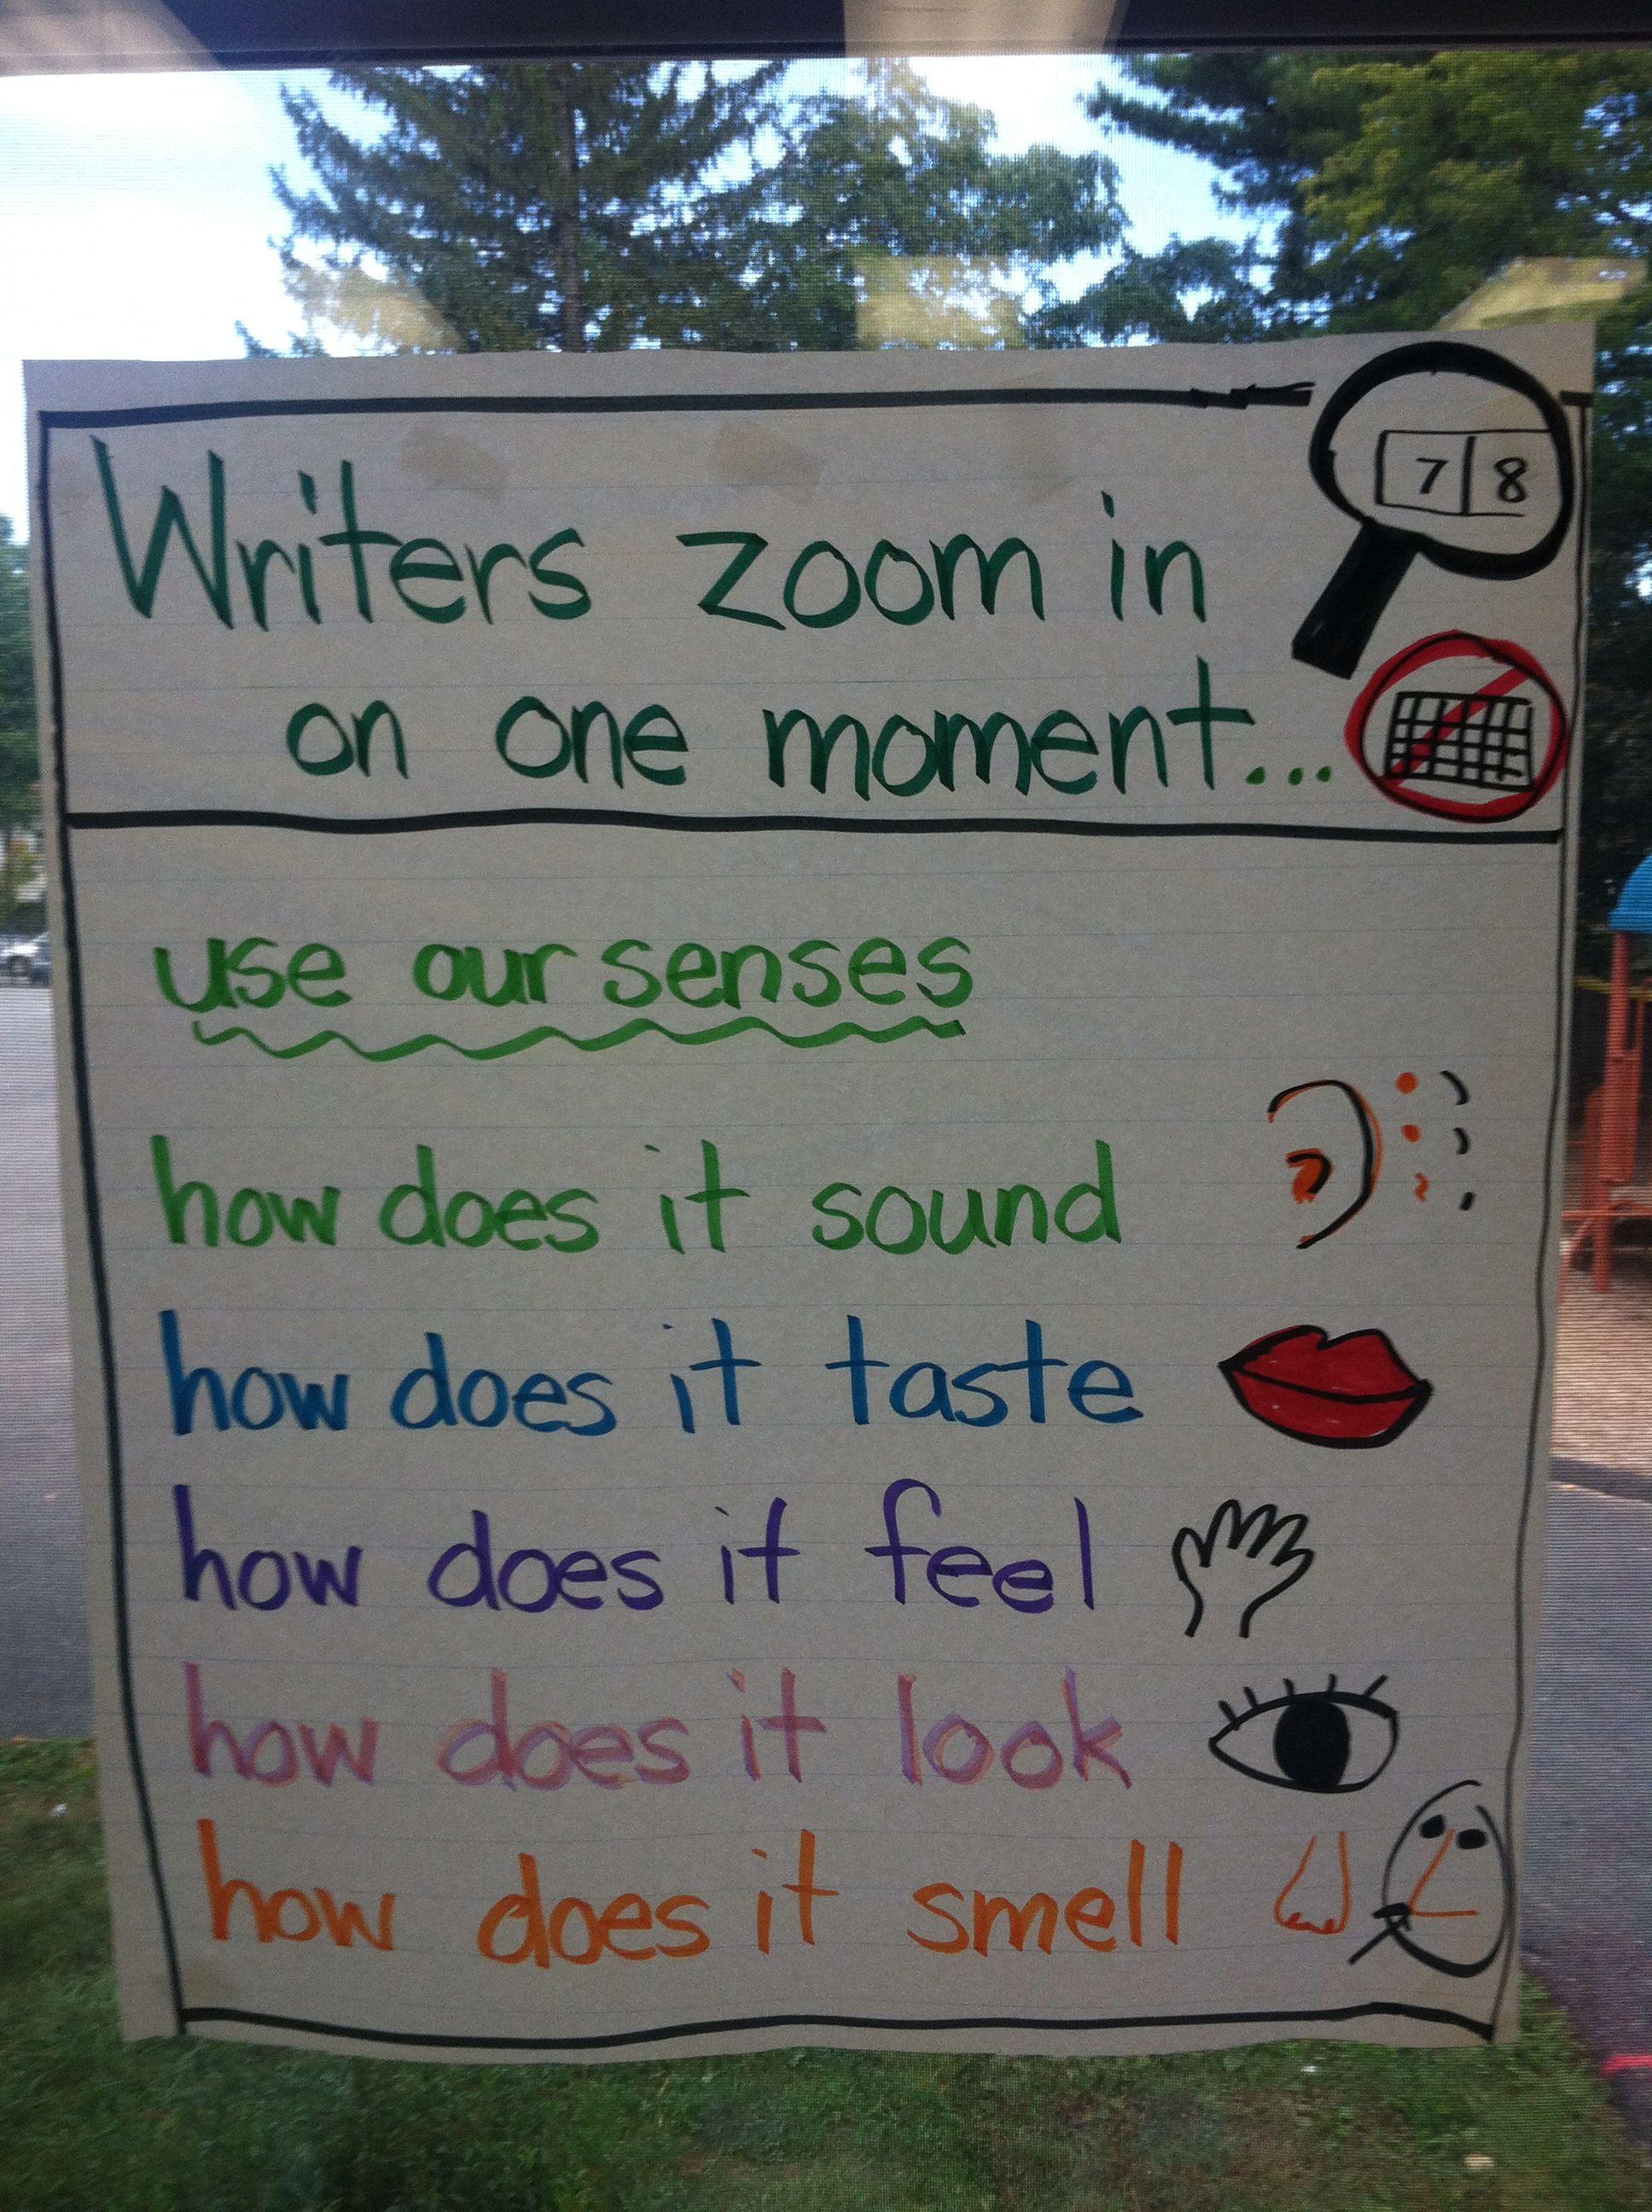 Writing Workshop Zoom In Sensory Details